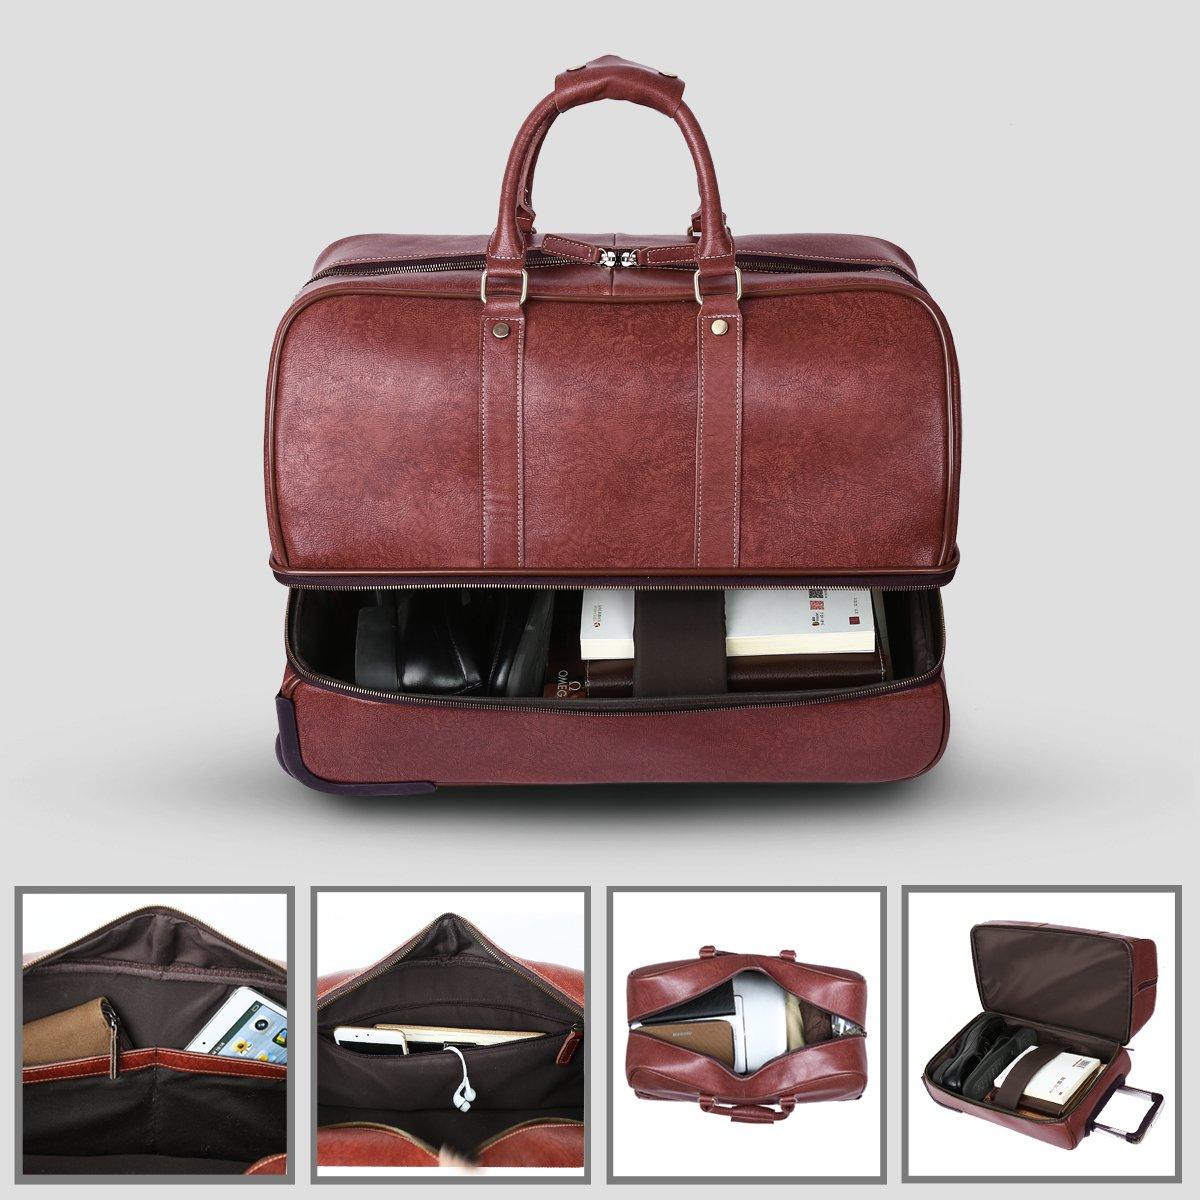 Leathario Leather Luggage travel duffle bag weekend overnight bag (Burgendy) by Leathario (Image #5)